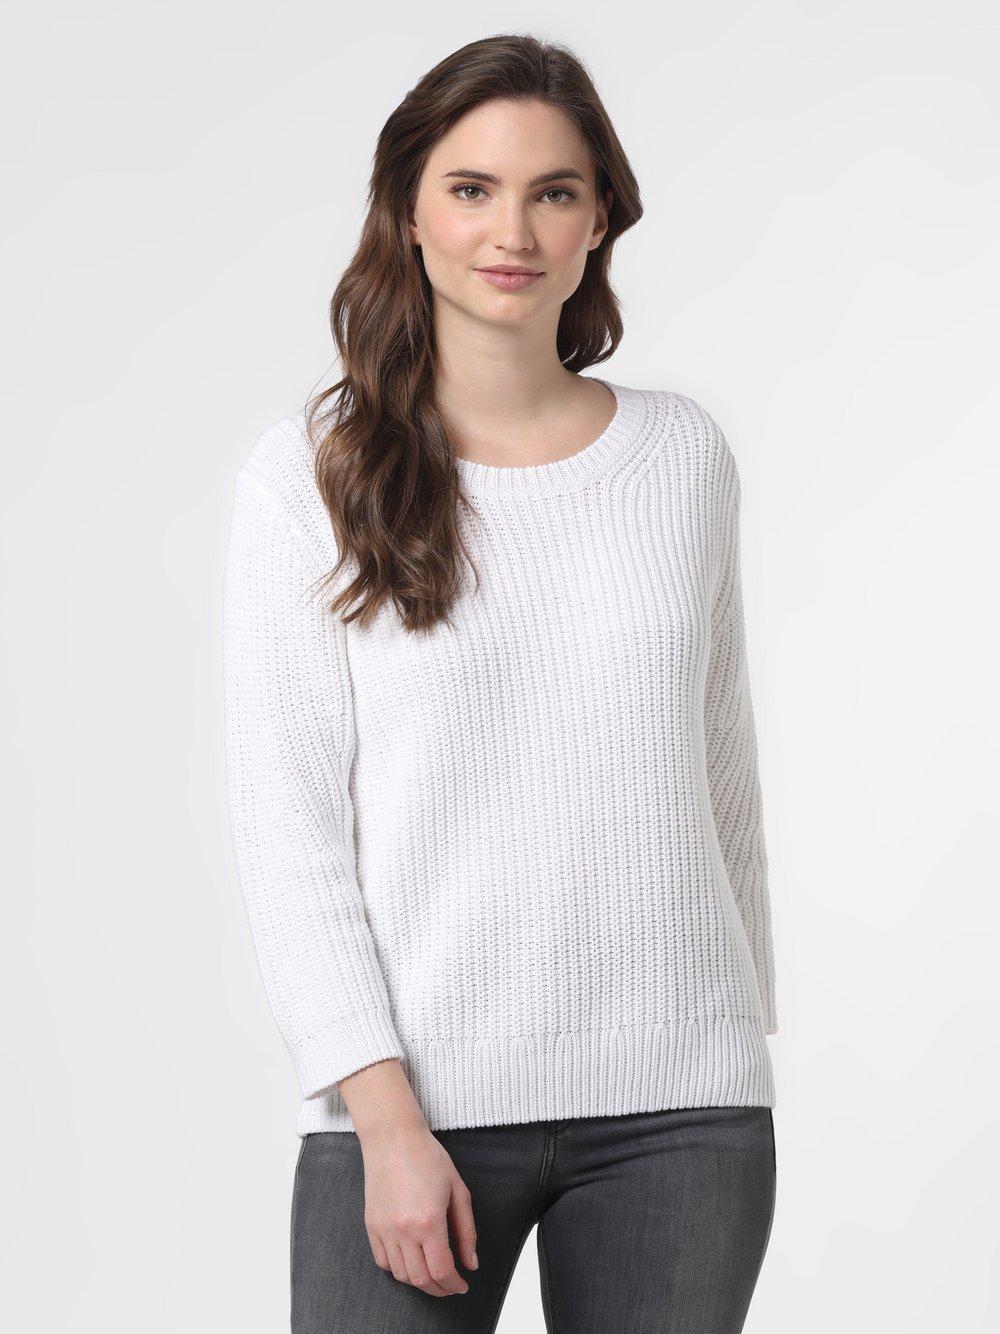 SvB Exquisit – Sweter damski, biały Van Graaf 461482-0002-00400